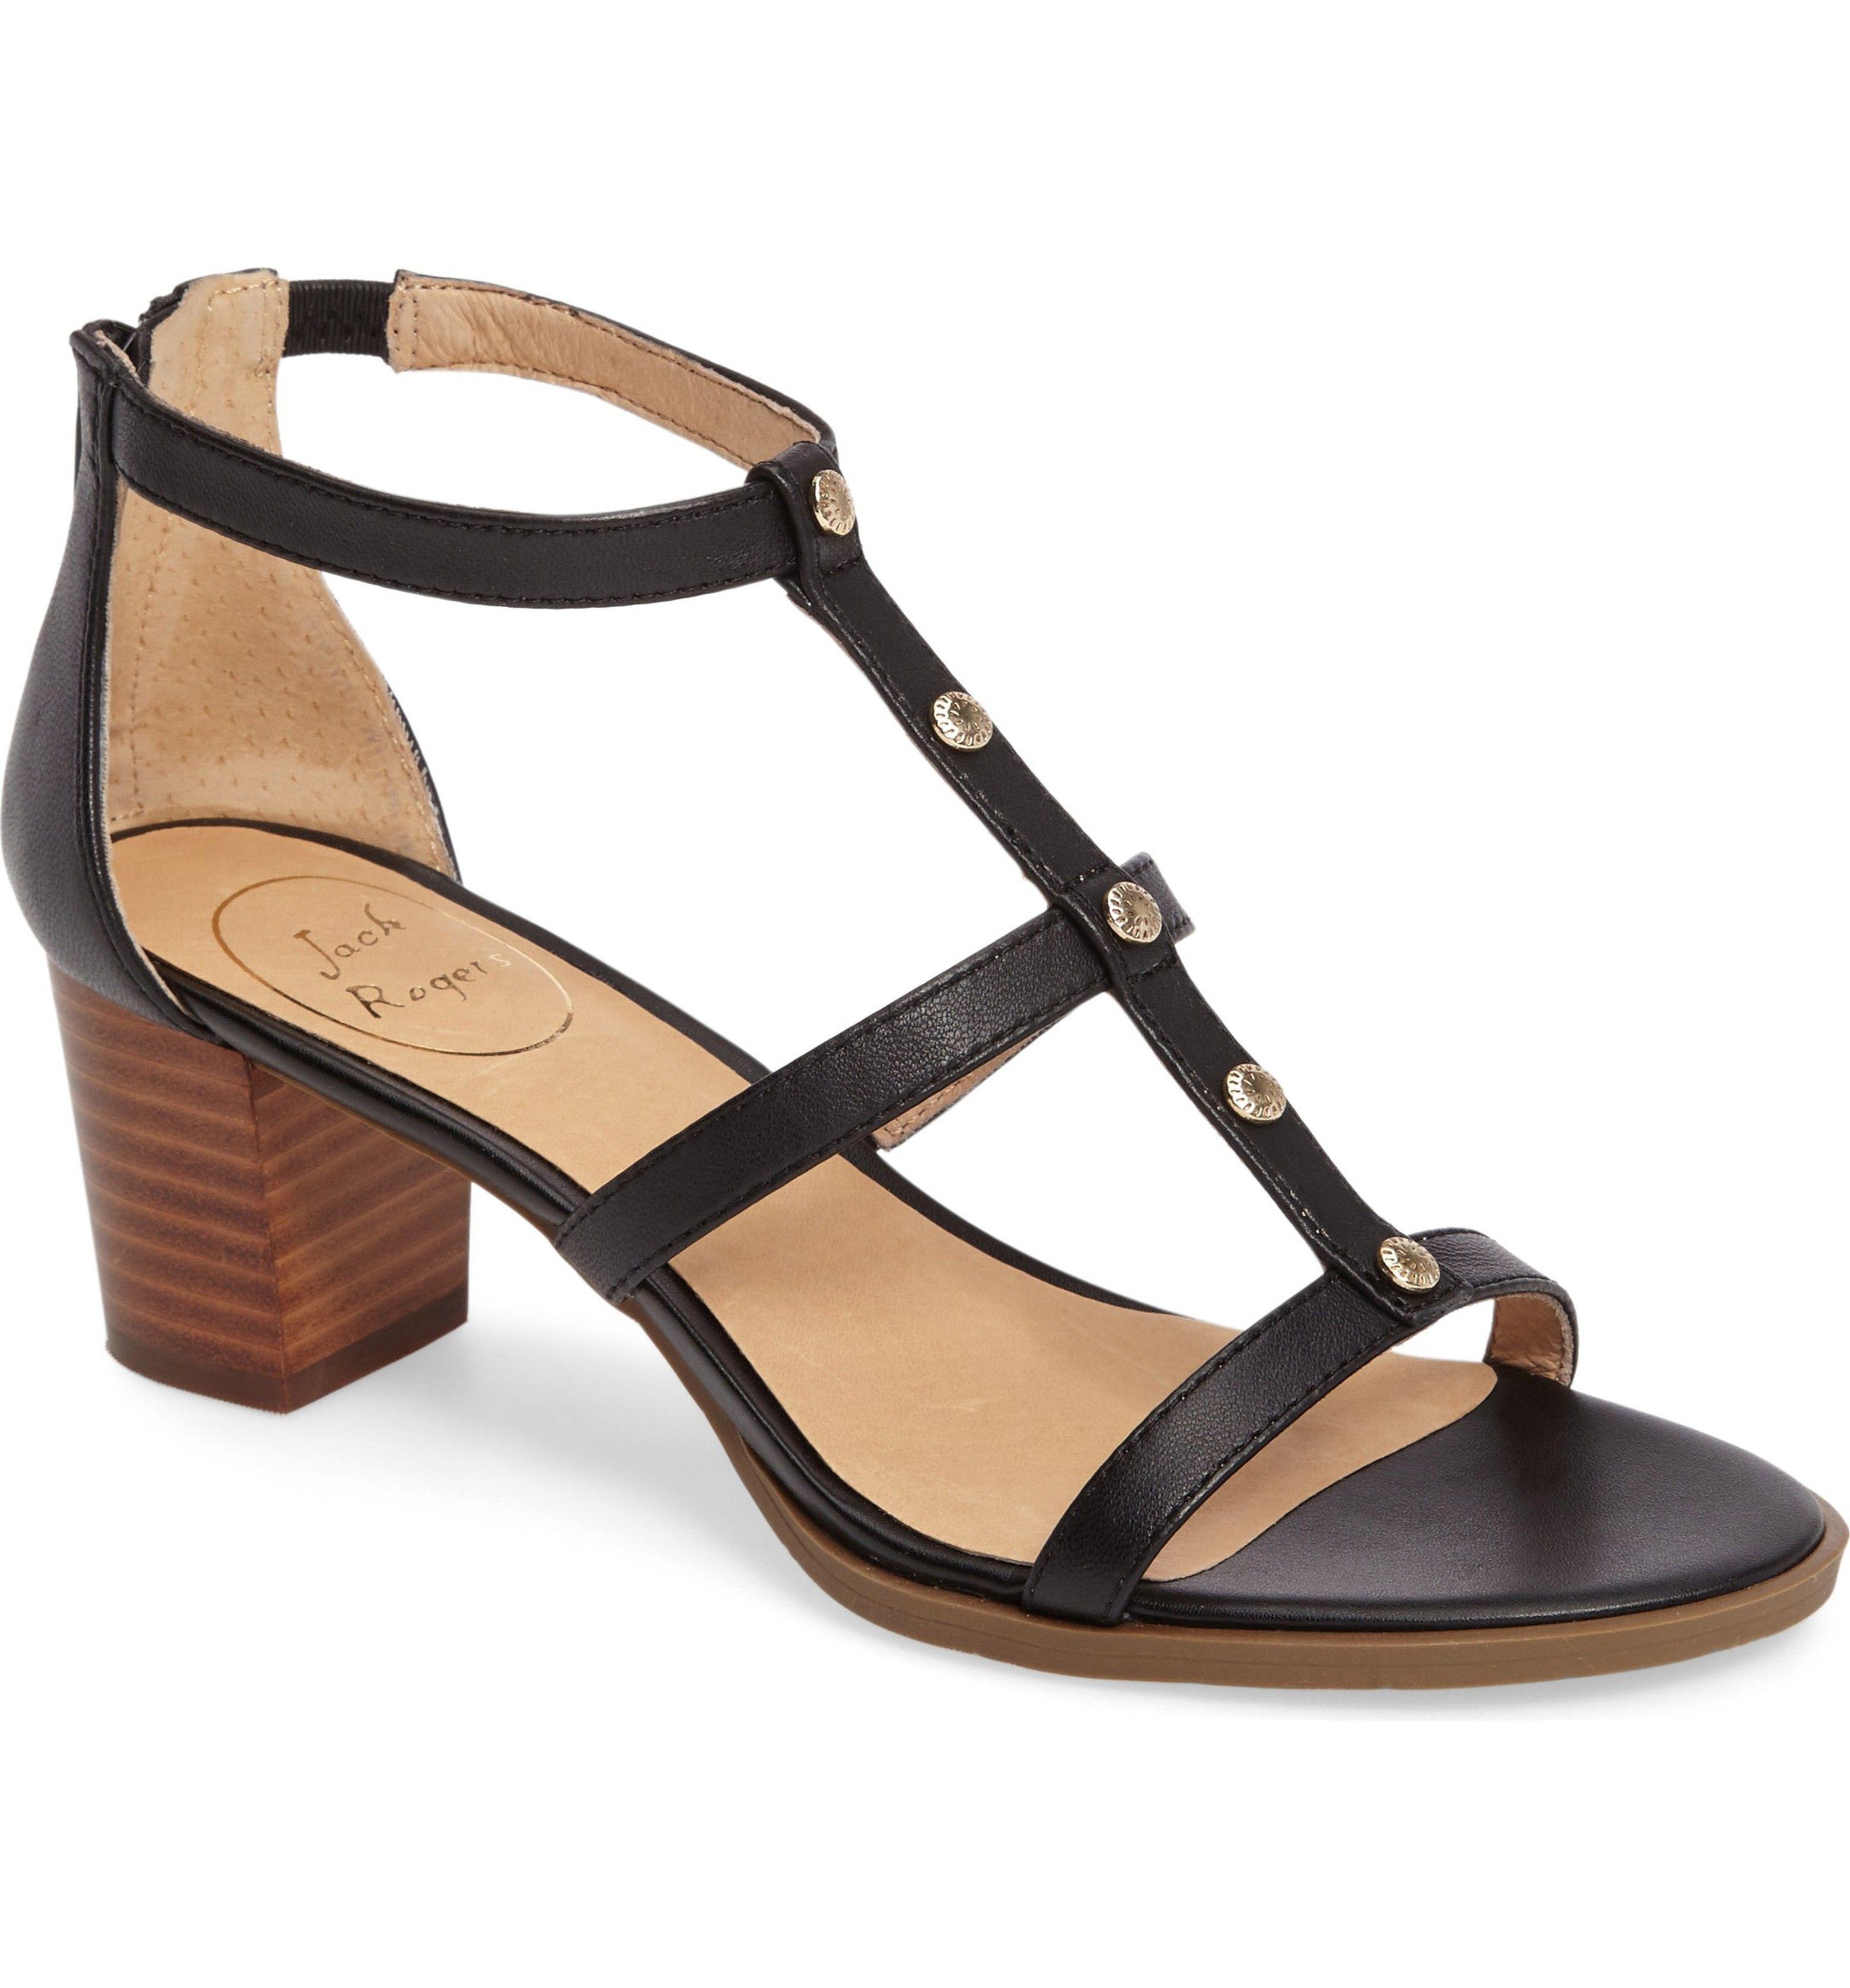 Main Image - Jack Rogers Julia Block Heel Sandal (Women)